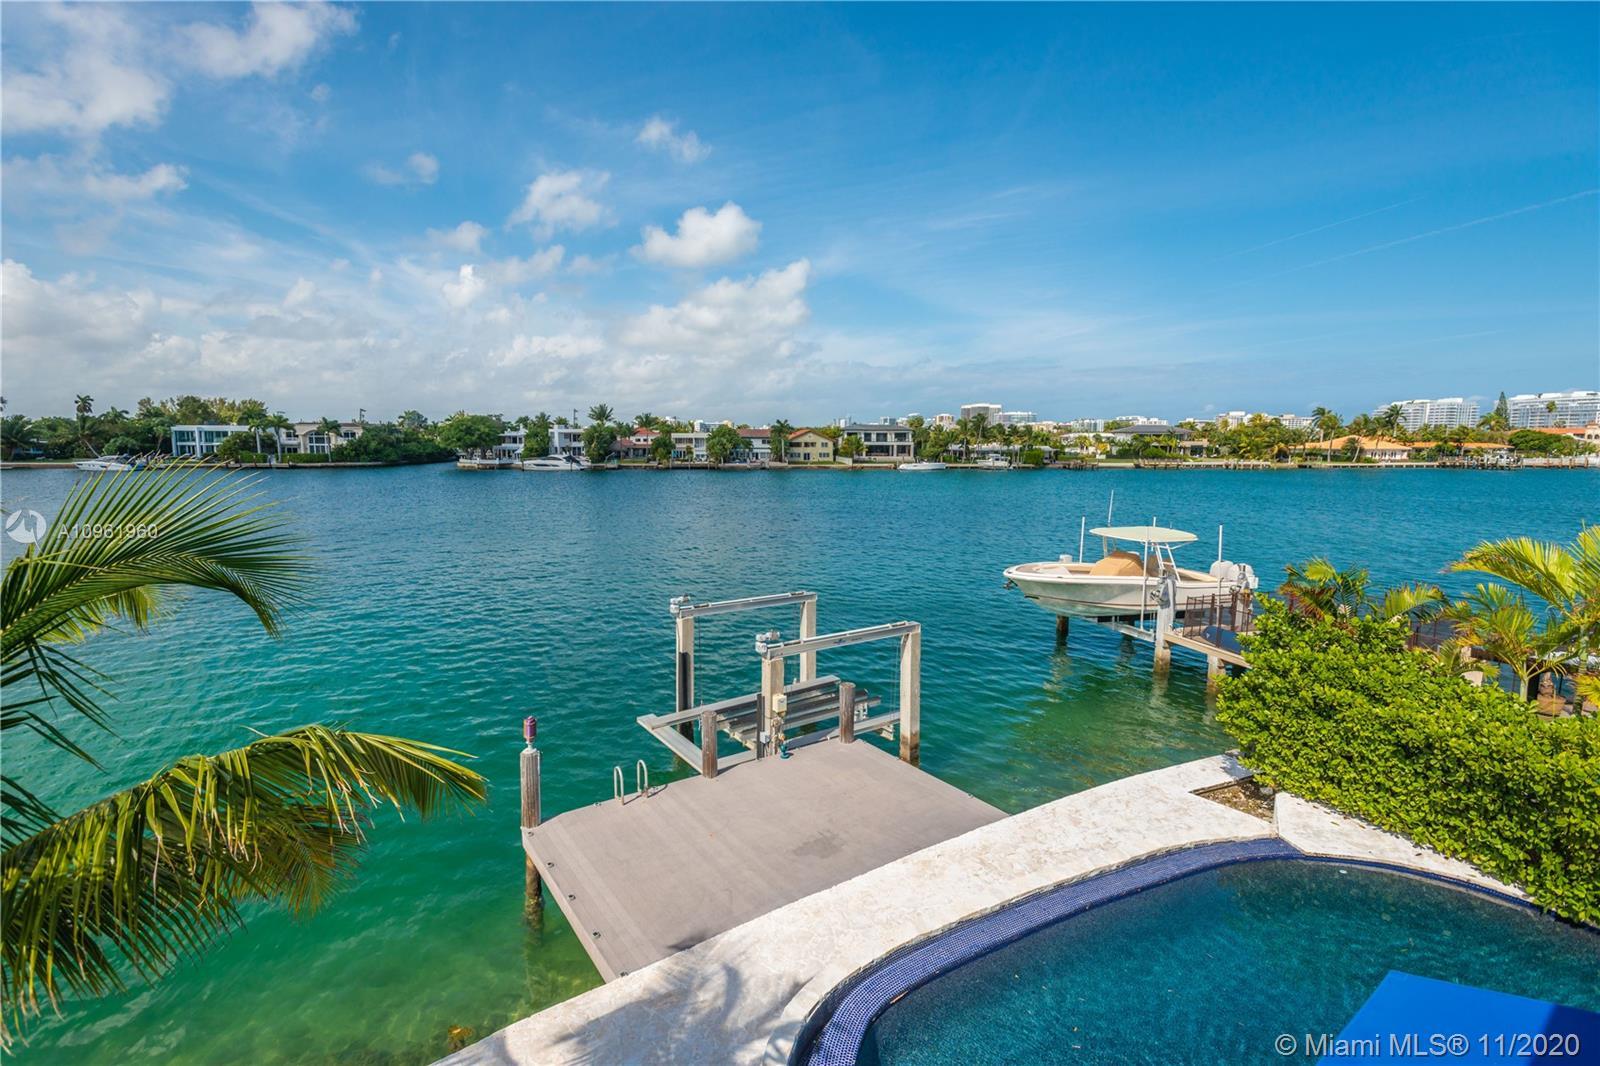 Biscayne Beach - 853 86 St, Miami Beach, FL 33141